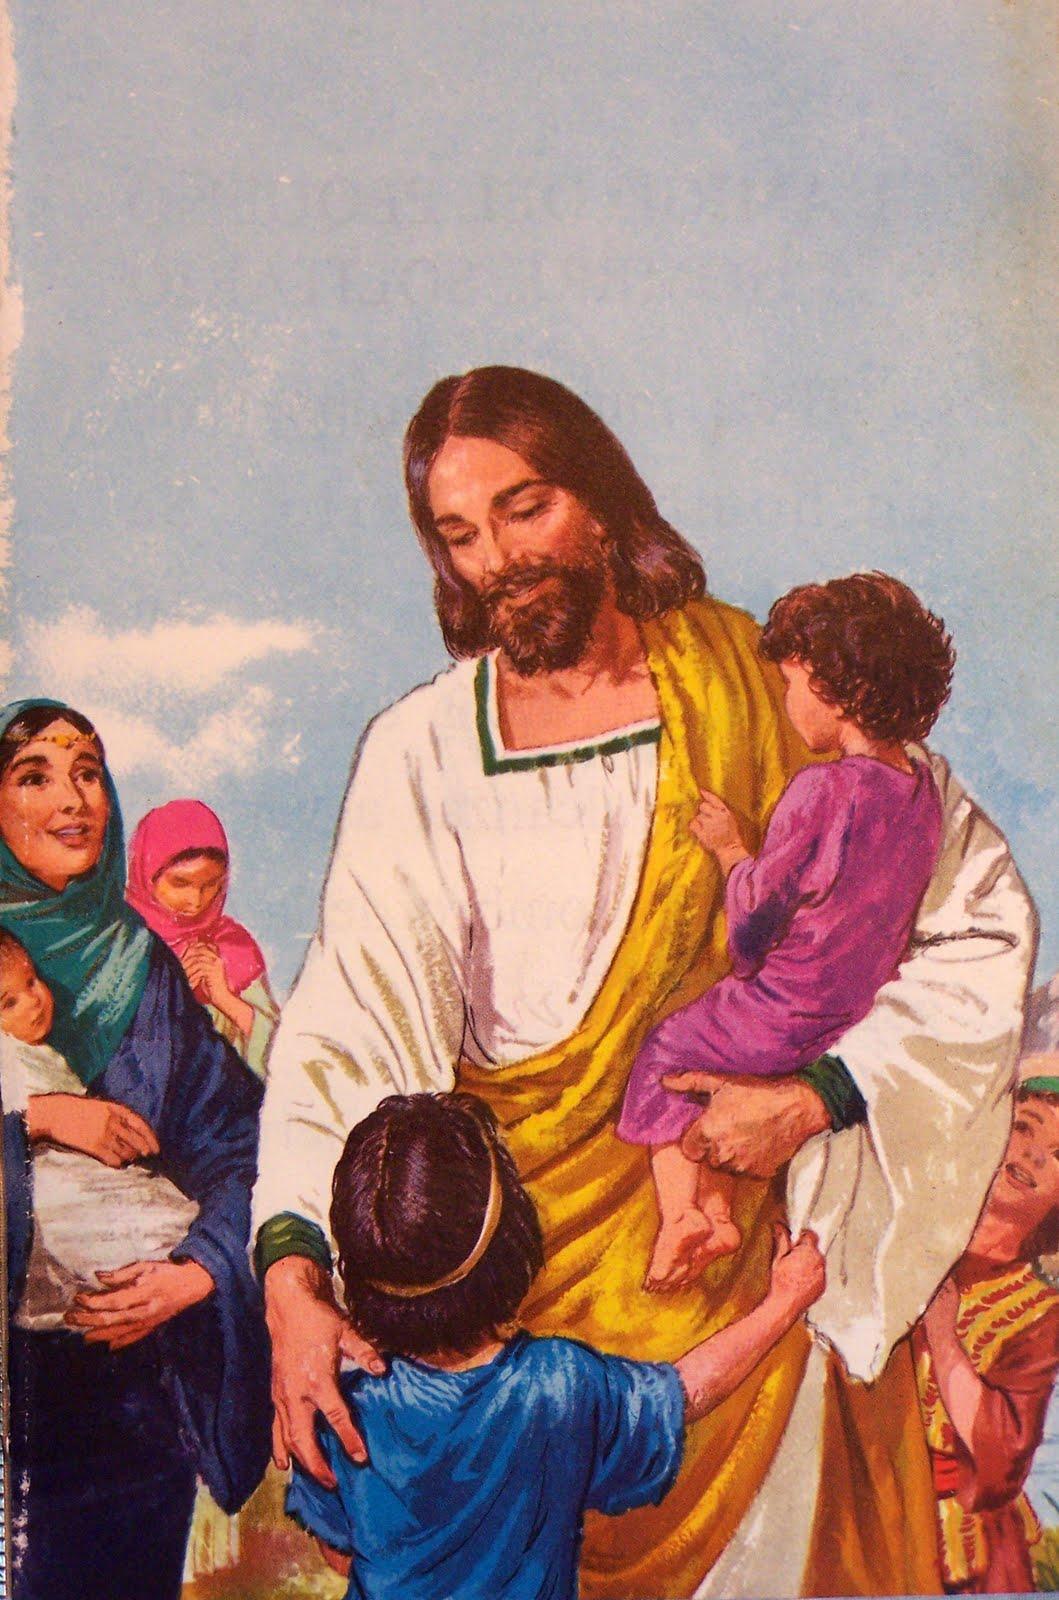 Children For Daz Studio And Poser: Jesus By Paulachan: 56 Jesus With Children